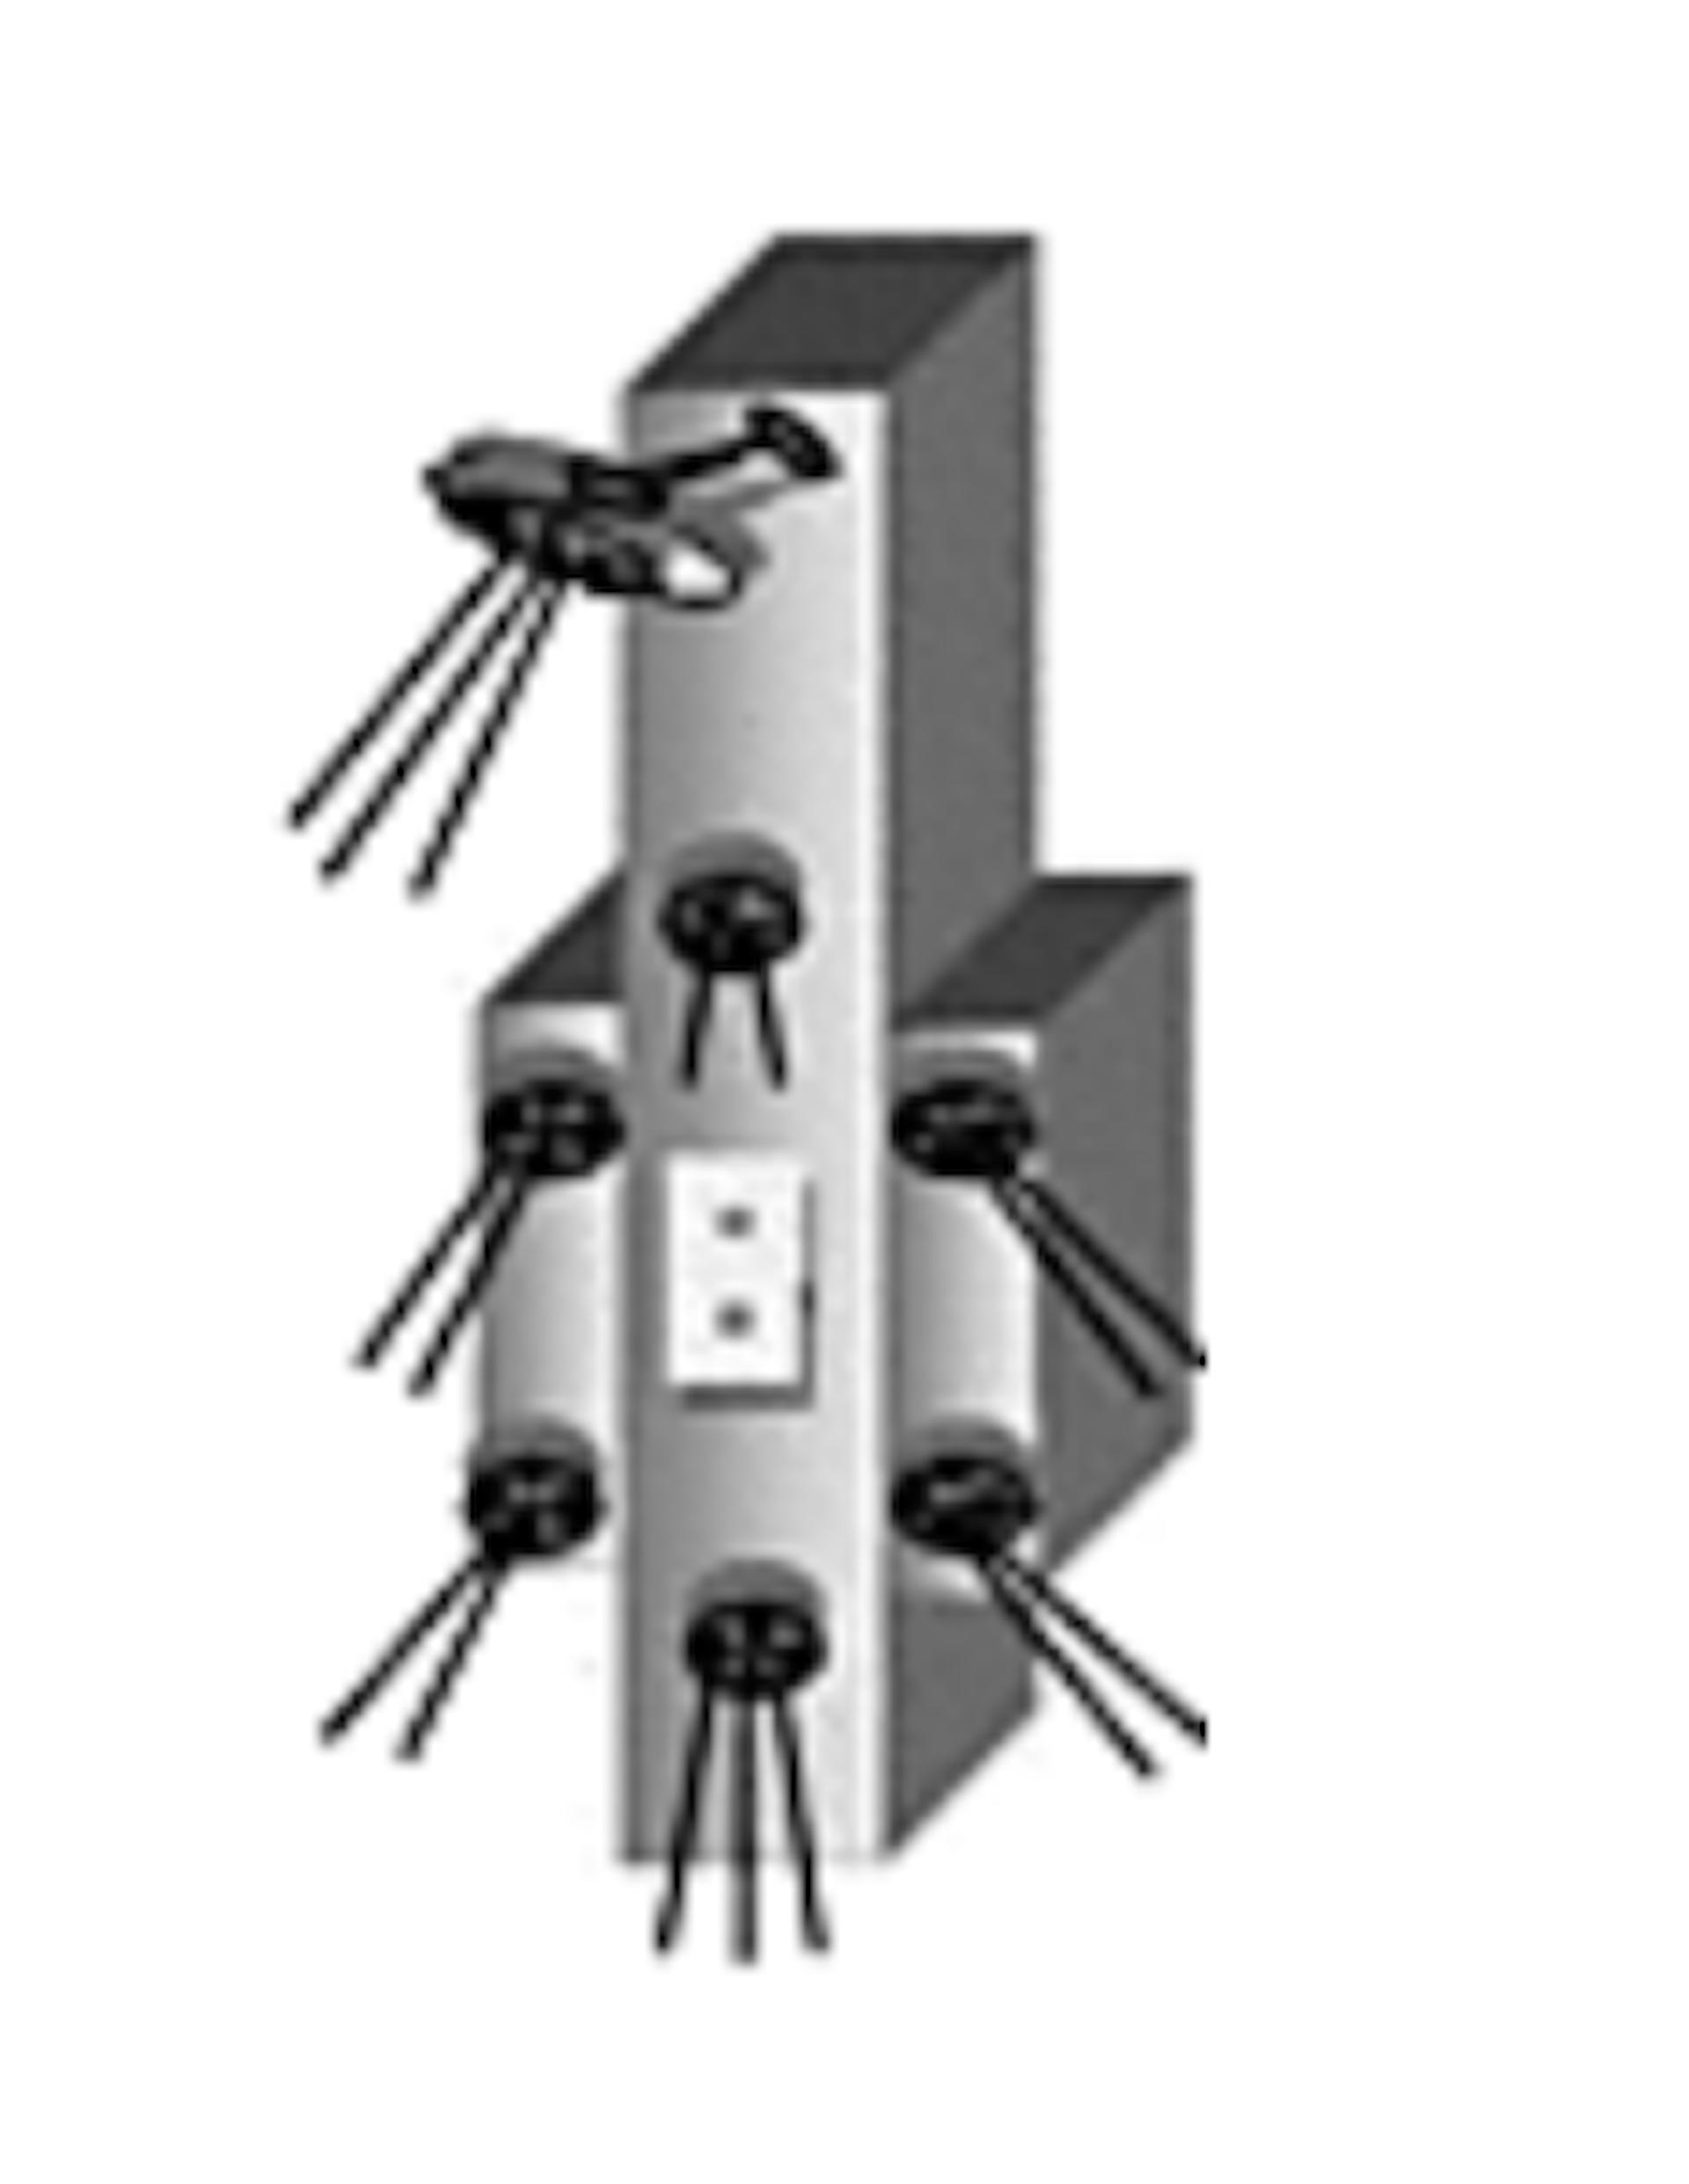 Vertical column with seven nozzles.